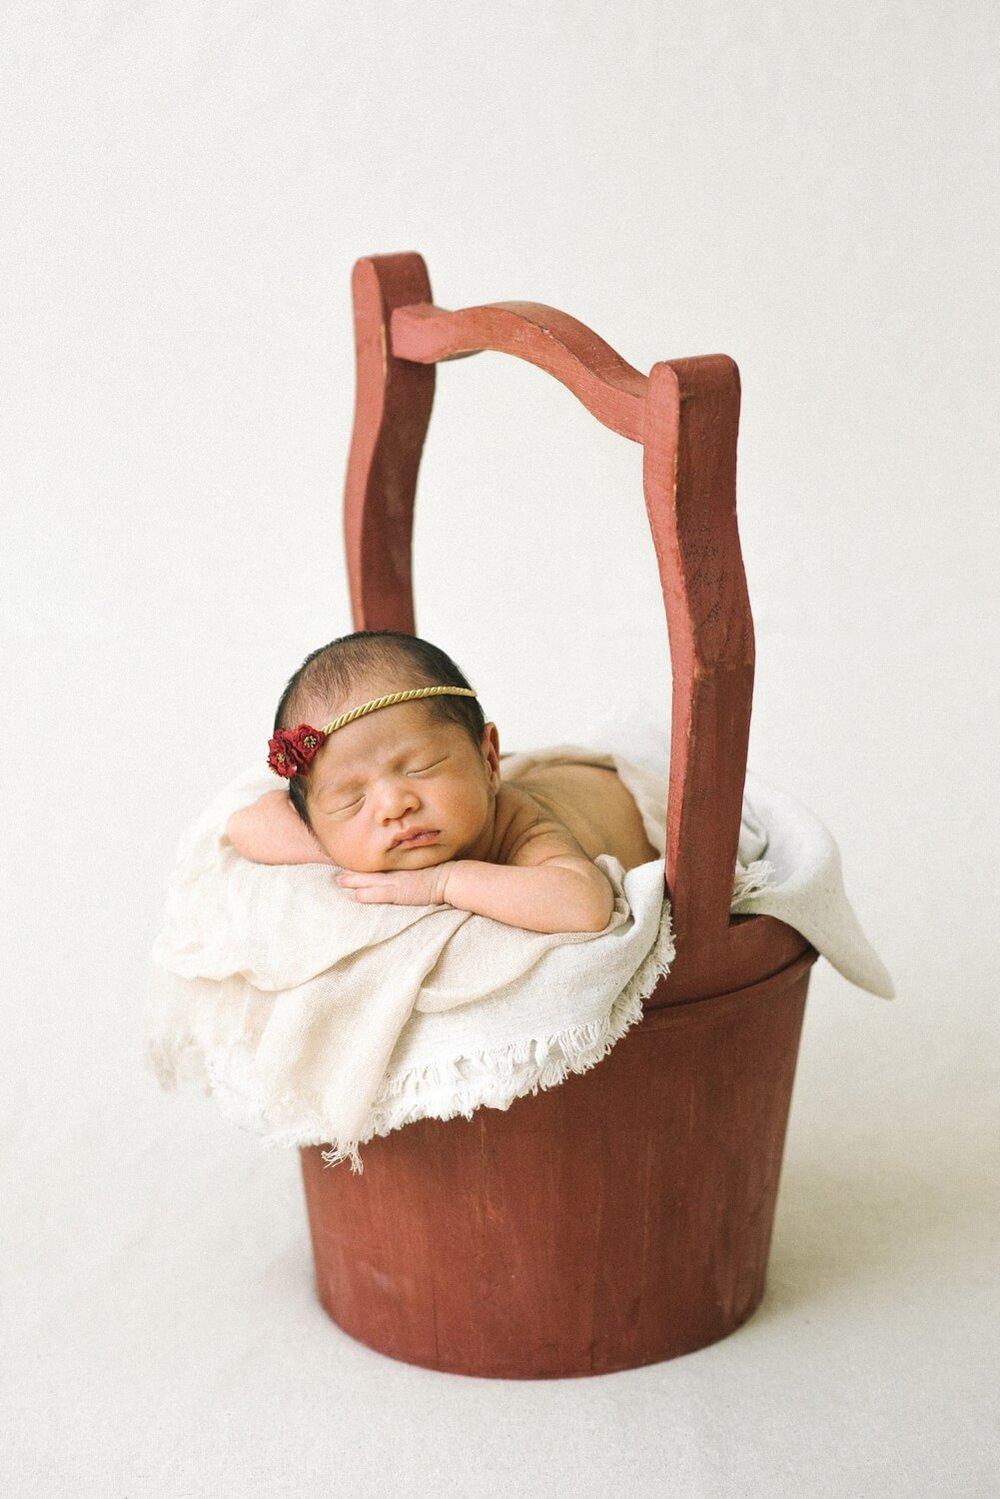 portland-oregon-newborn-photographer-sleeping-baby-girl-red-basket-shelley-marie-photography-2.jpg